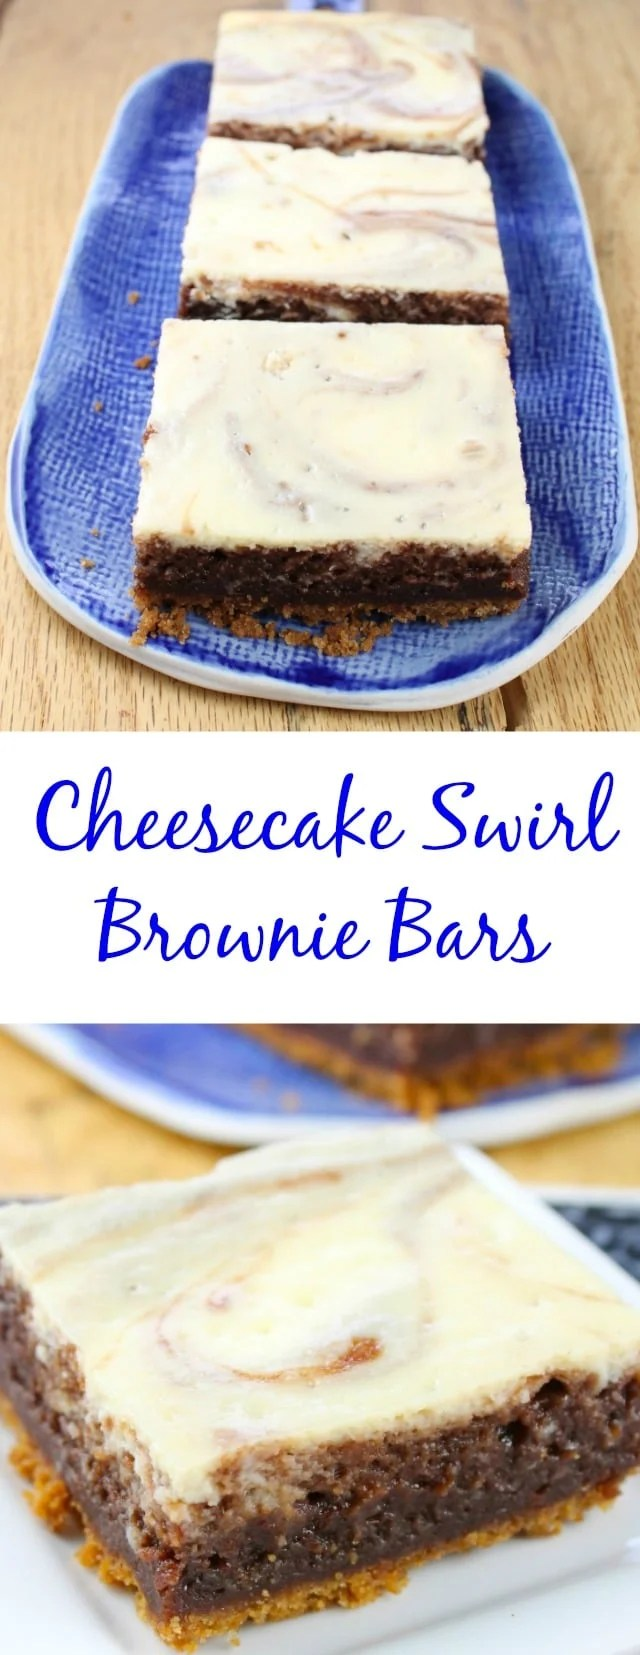 Cheesecake Swirl Brownie Bars from Dessert Mash-Ups ~ Miss in the Kitchen